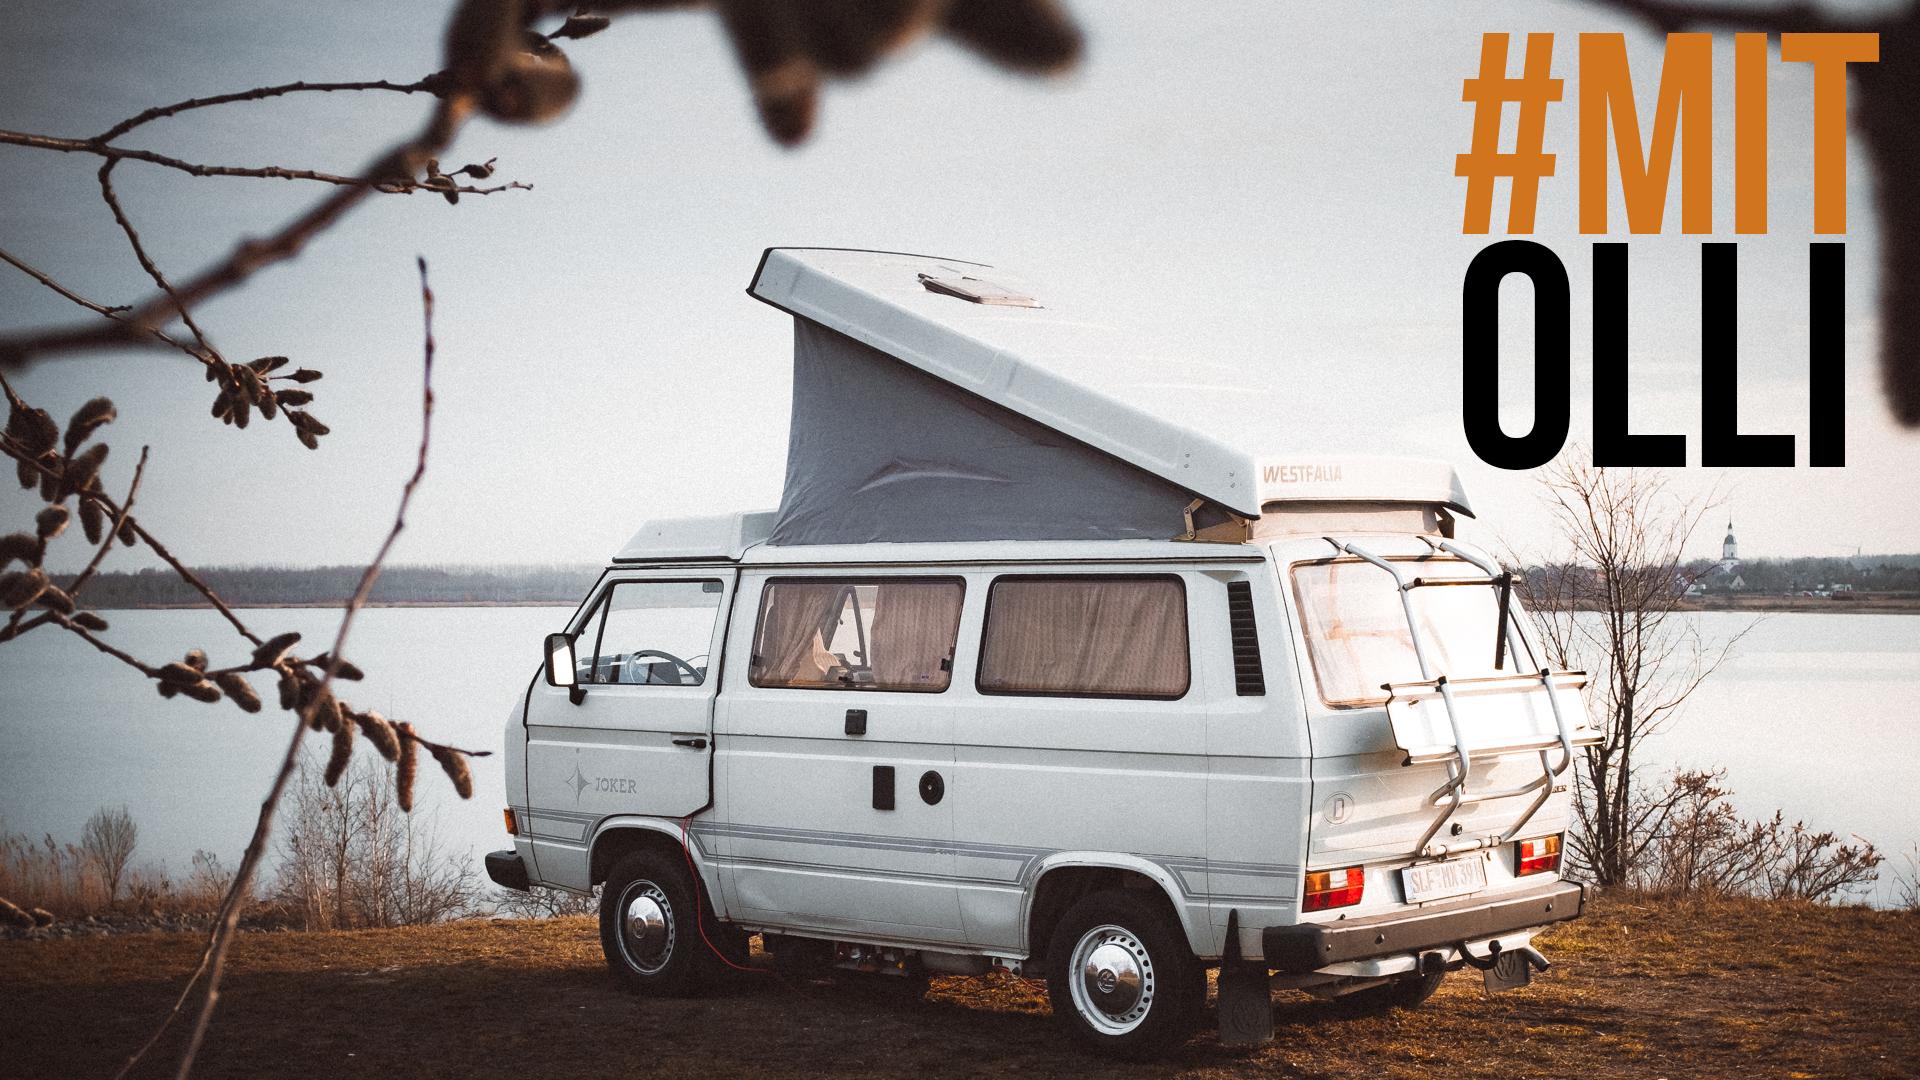 Roomtour durch meinen VW T3 Bulli Camper | Erster Fuji X-T3 Test